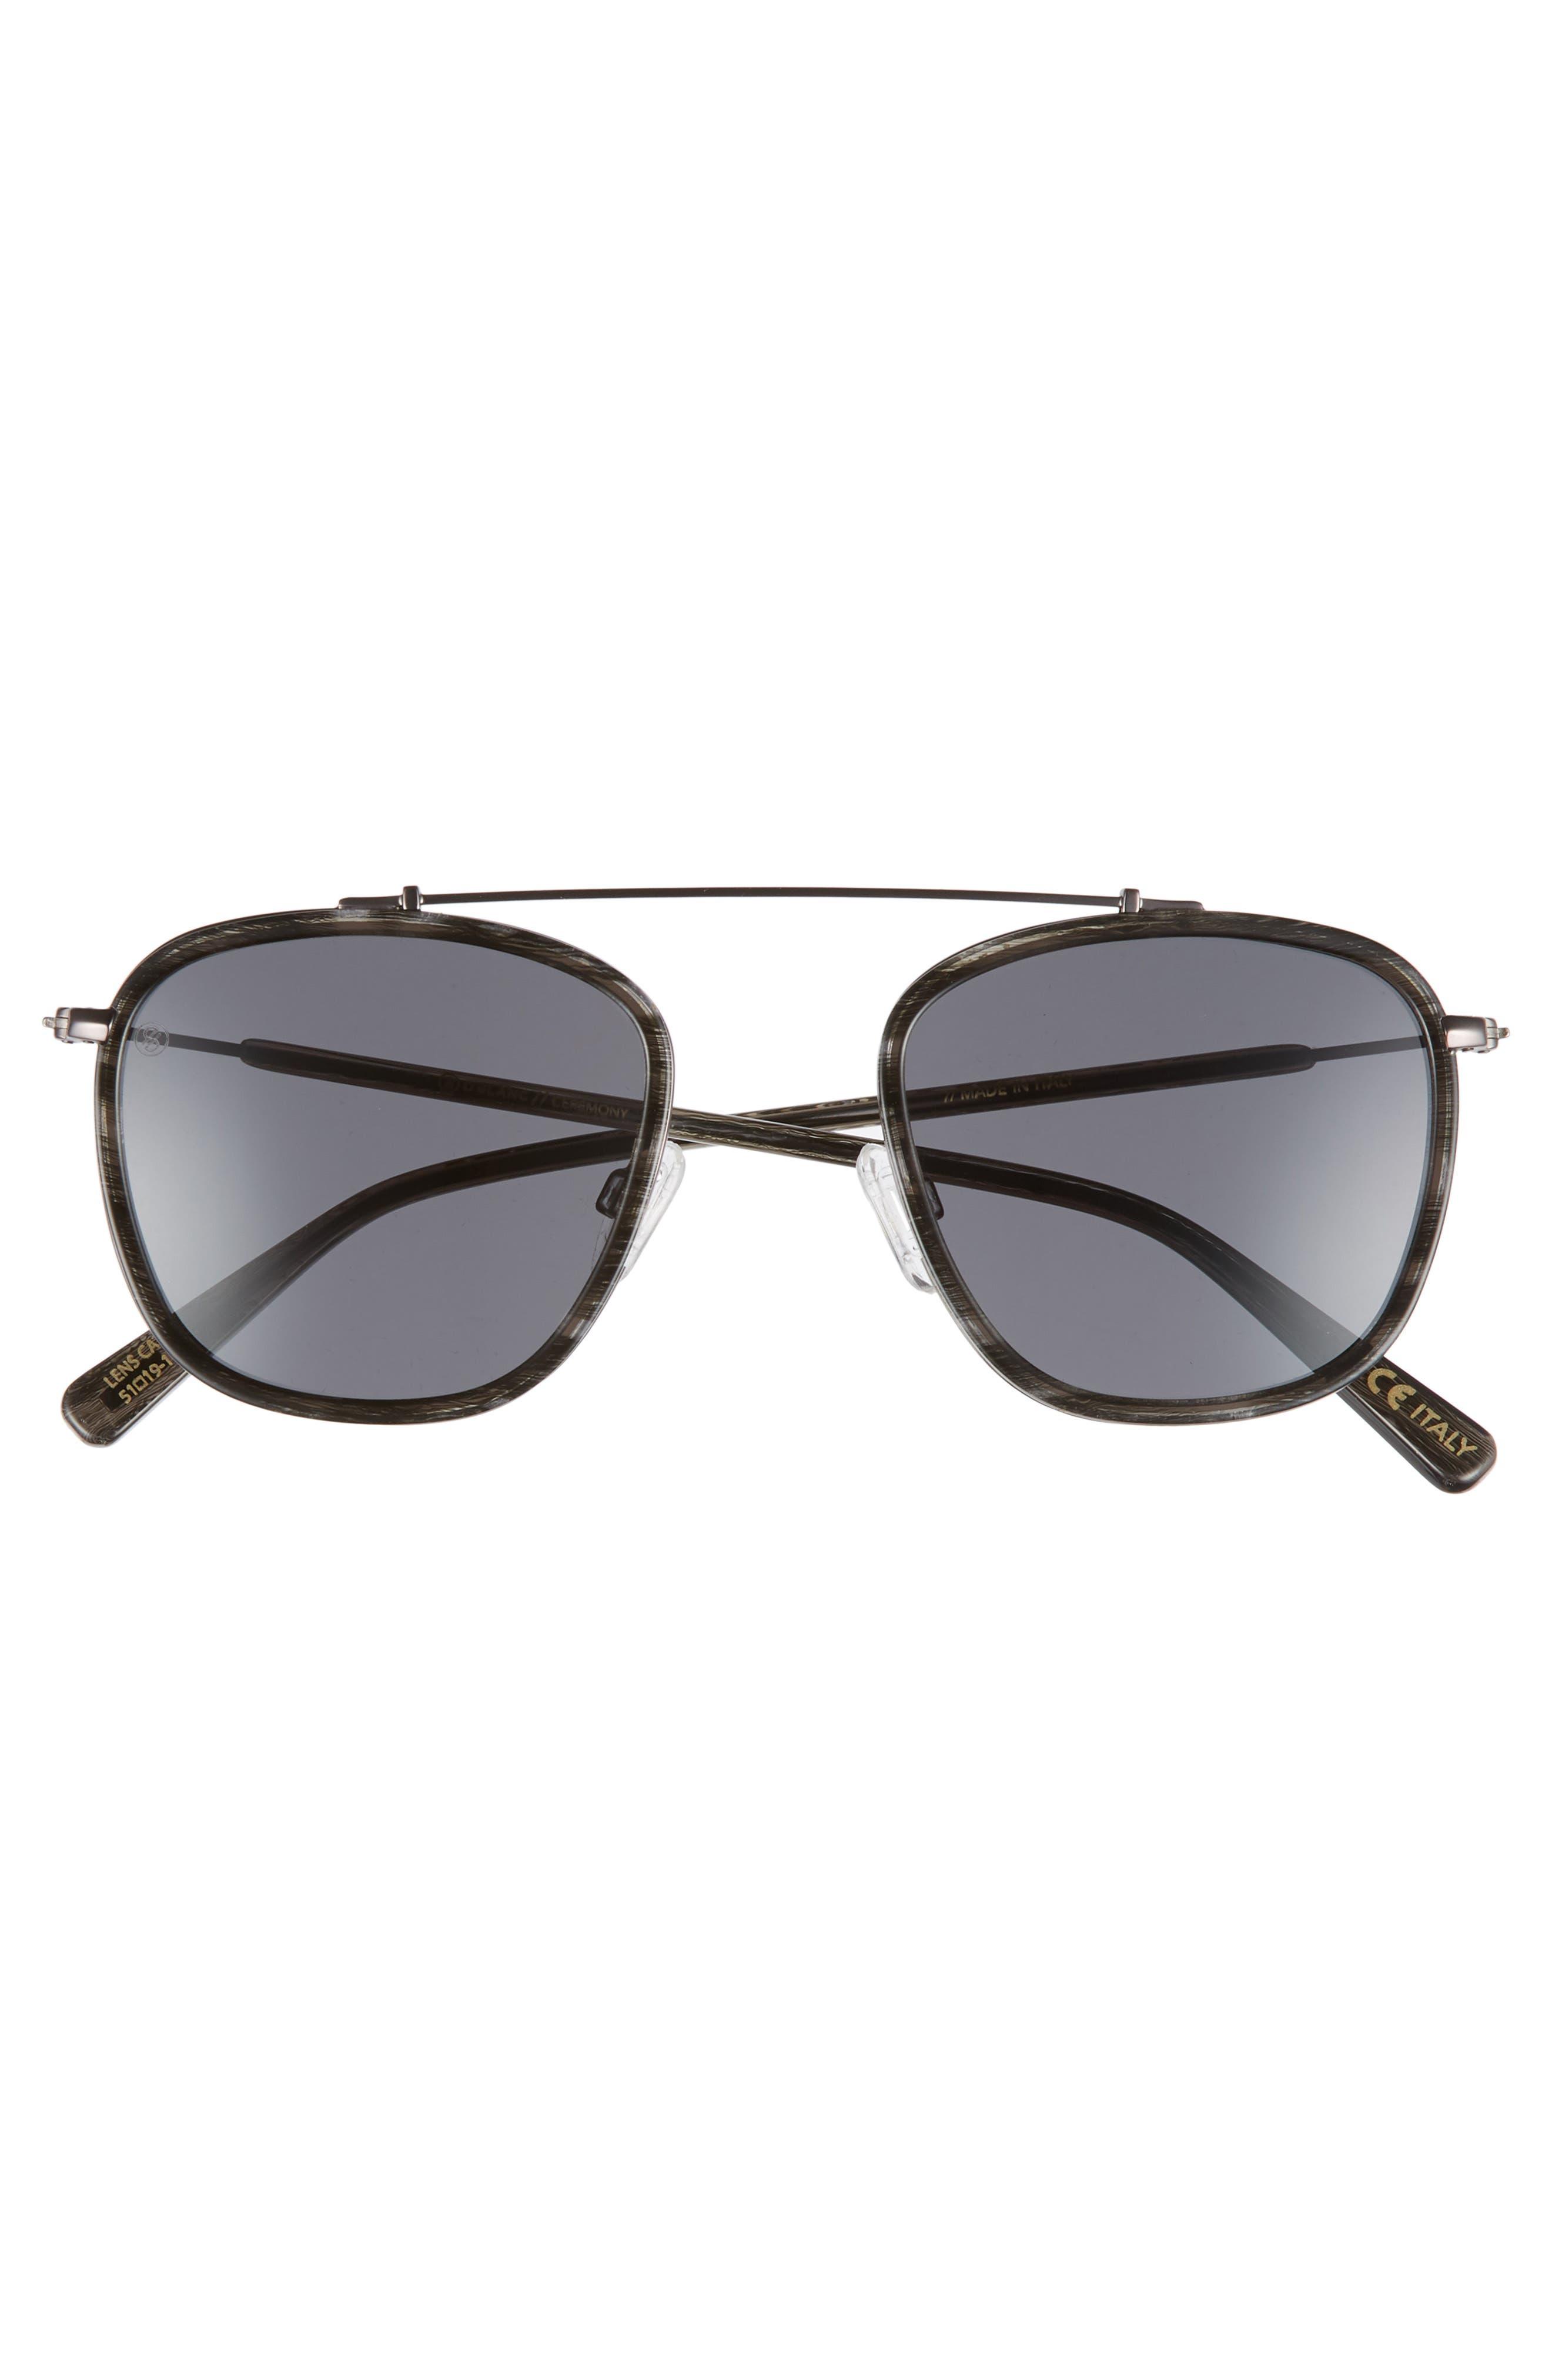 D'BLANC Ceremony 51mm Square Sunglasses,                             Alternate thumbnail 3, color,                             001